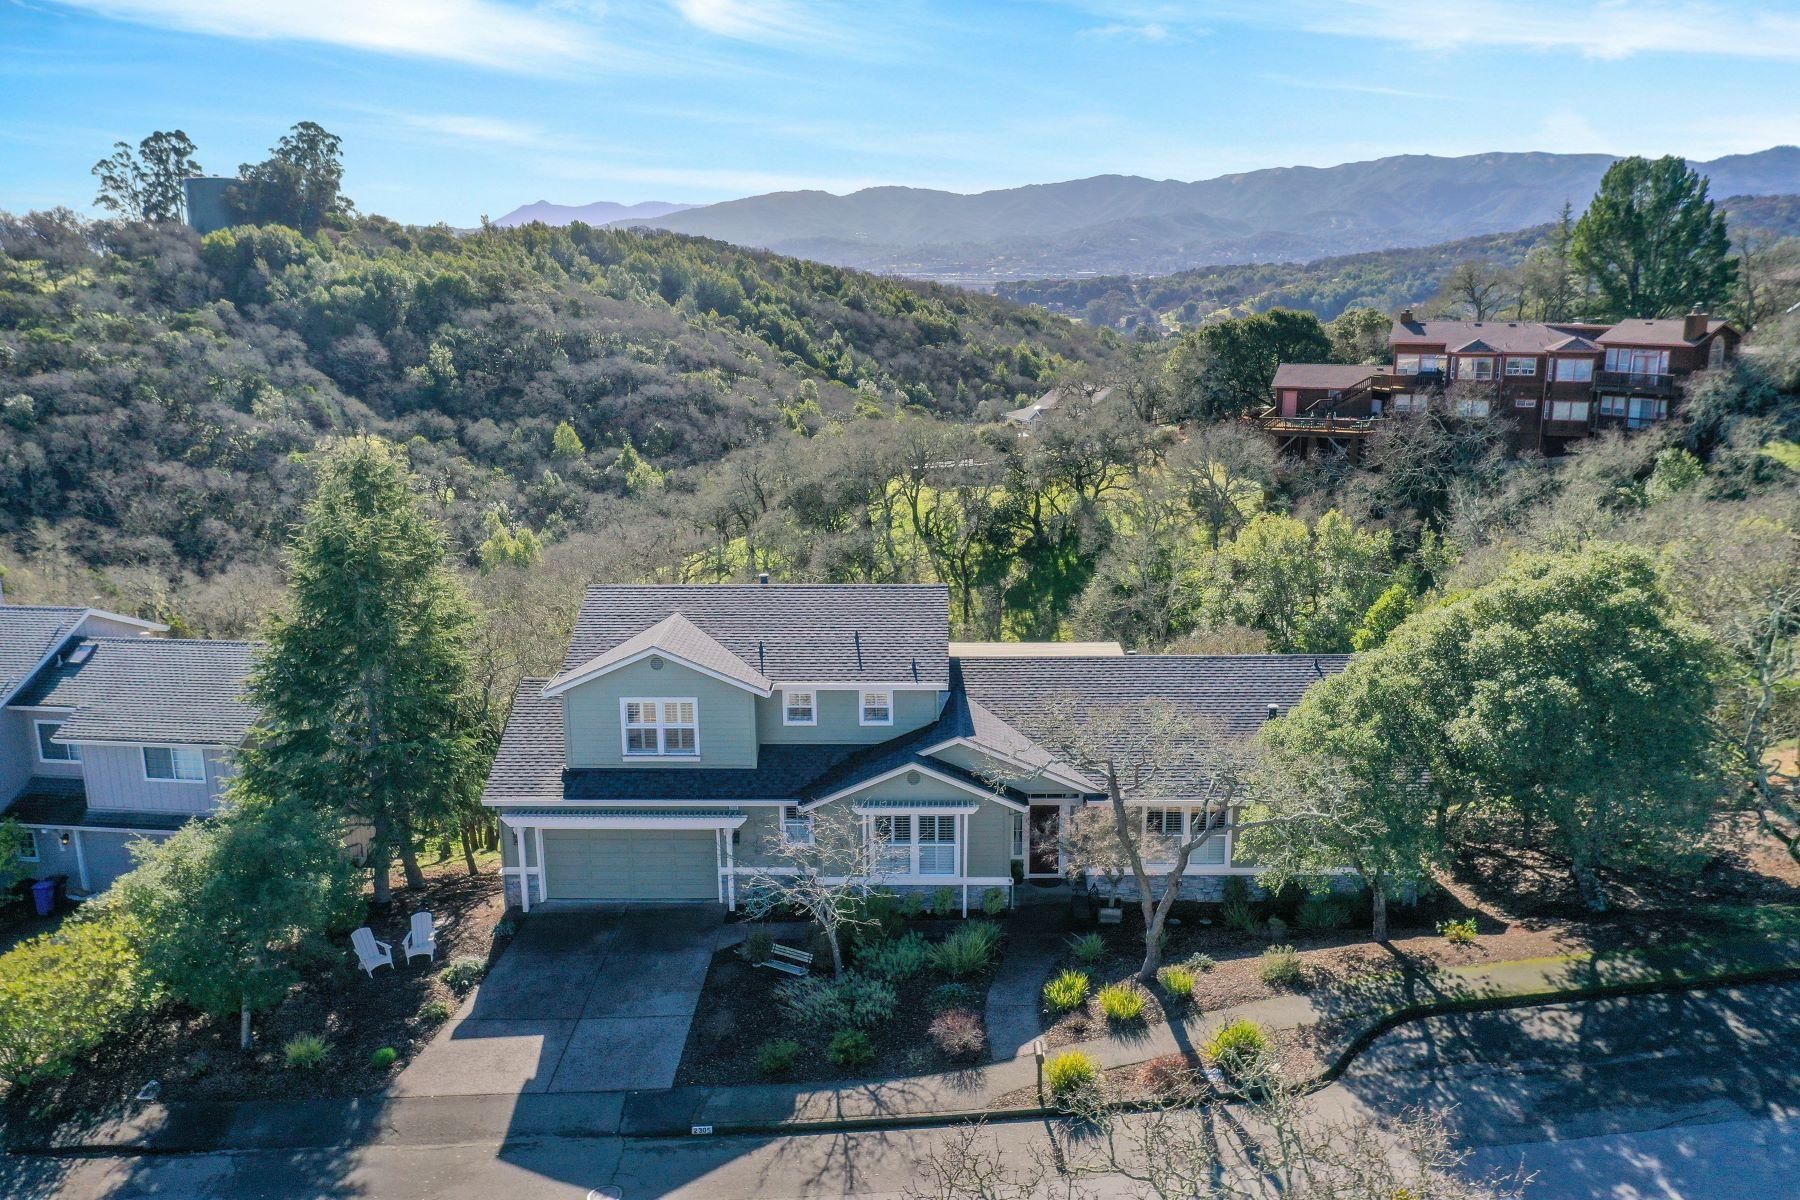 Single Family Homes for Sale at Privacy & Views 2305 Laguna Vista Drive Novato, California 94945 United States